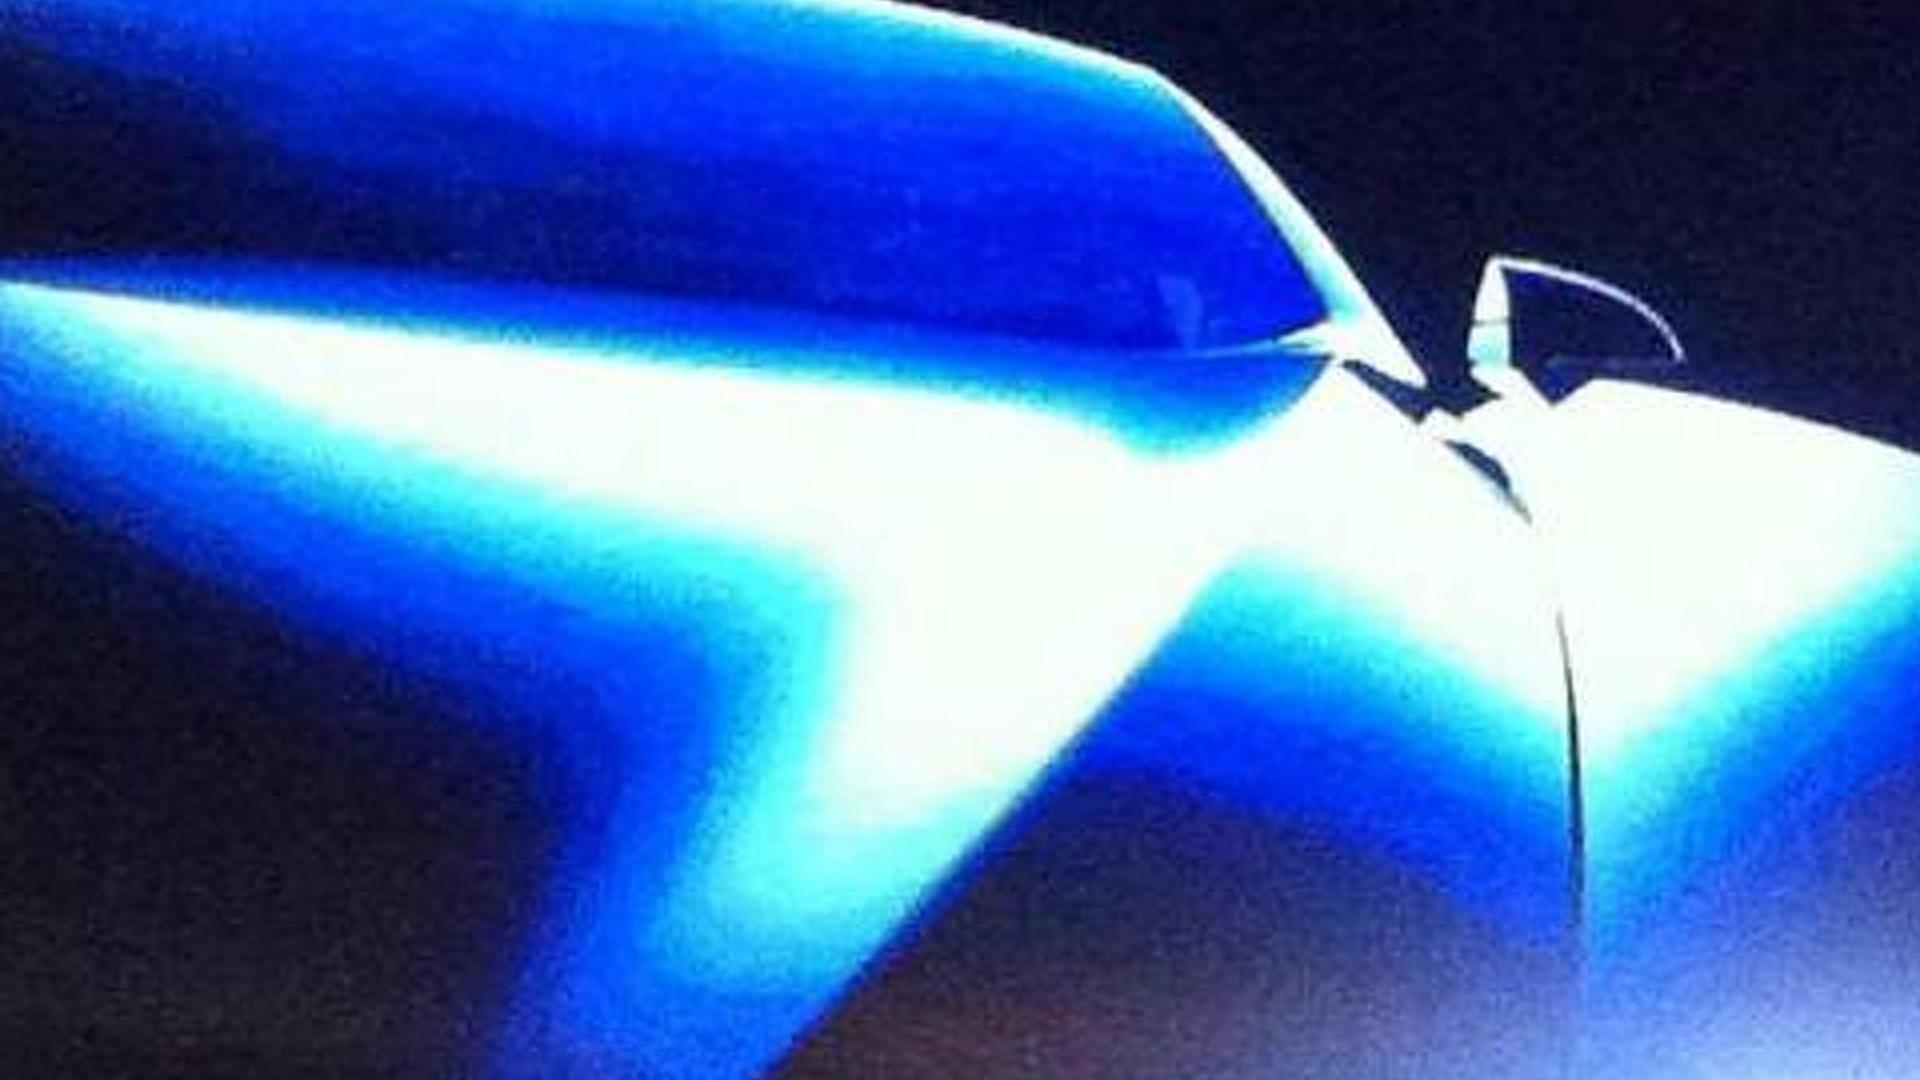 Cadillac teases a new concept at Pebble Beach